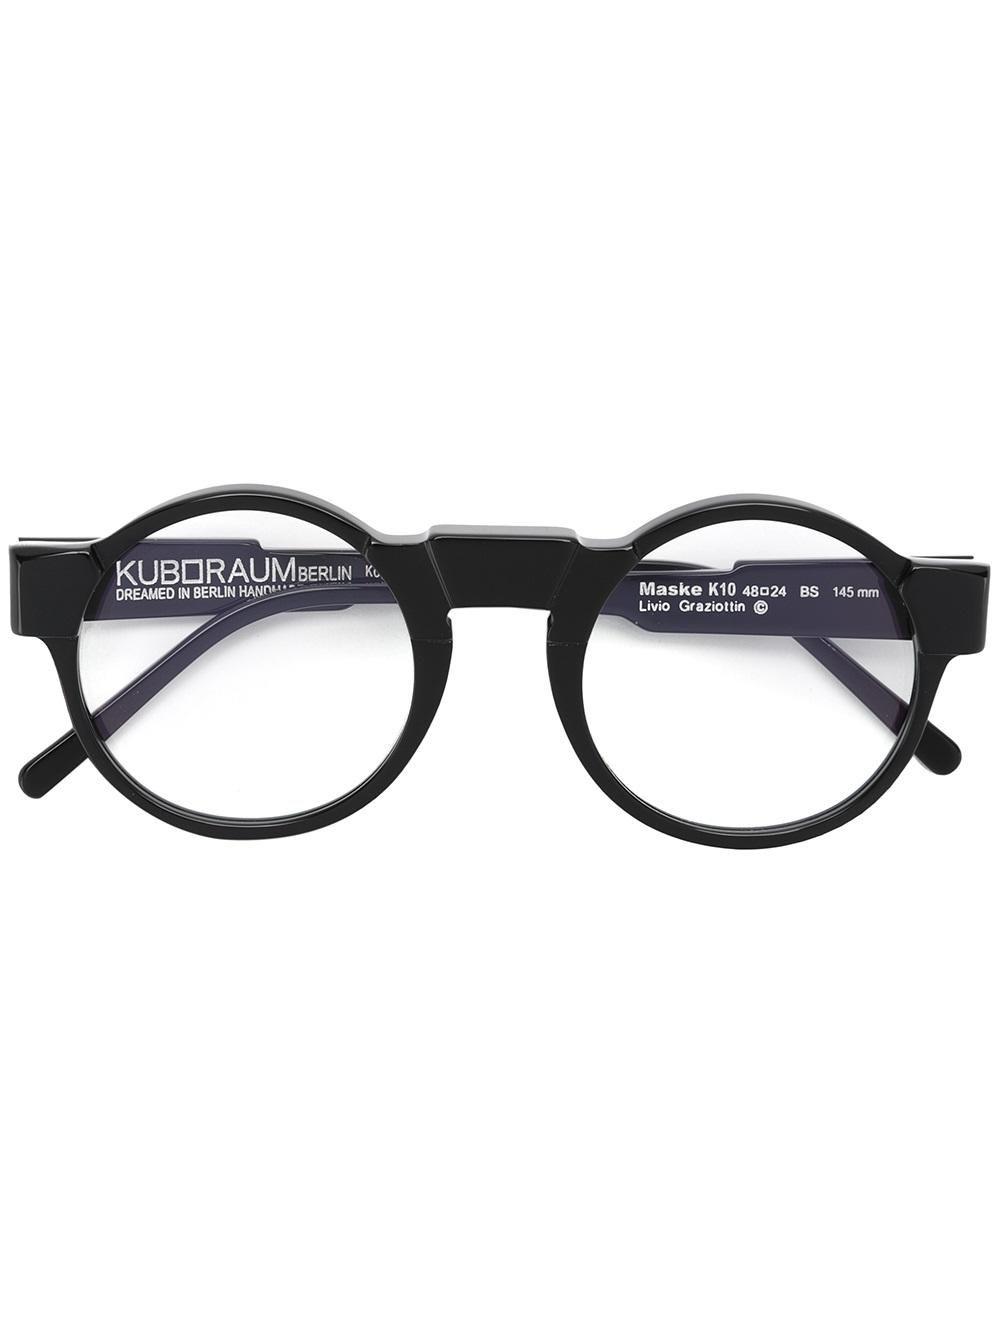 2a28d0c41b Kuboraum round frame glasses